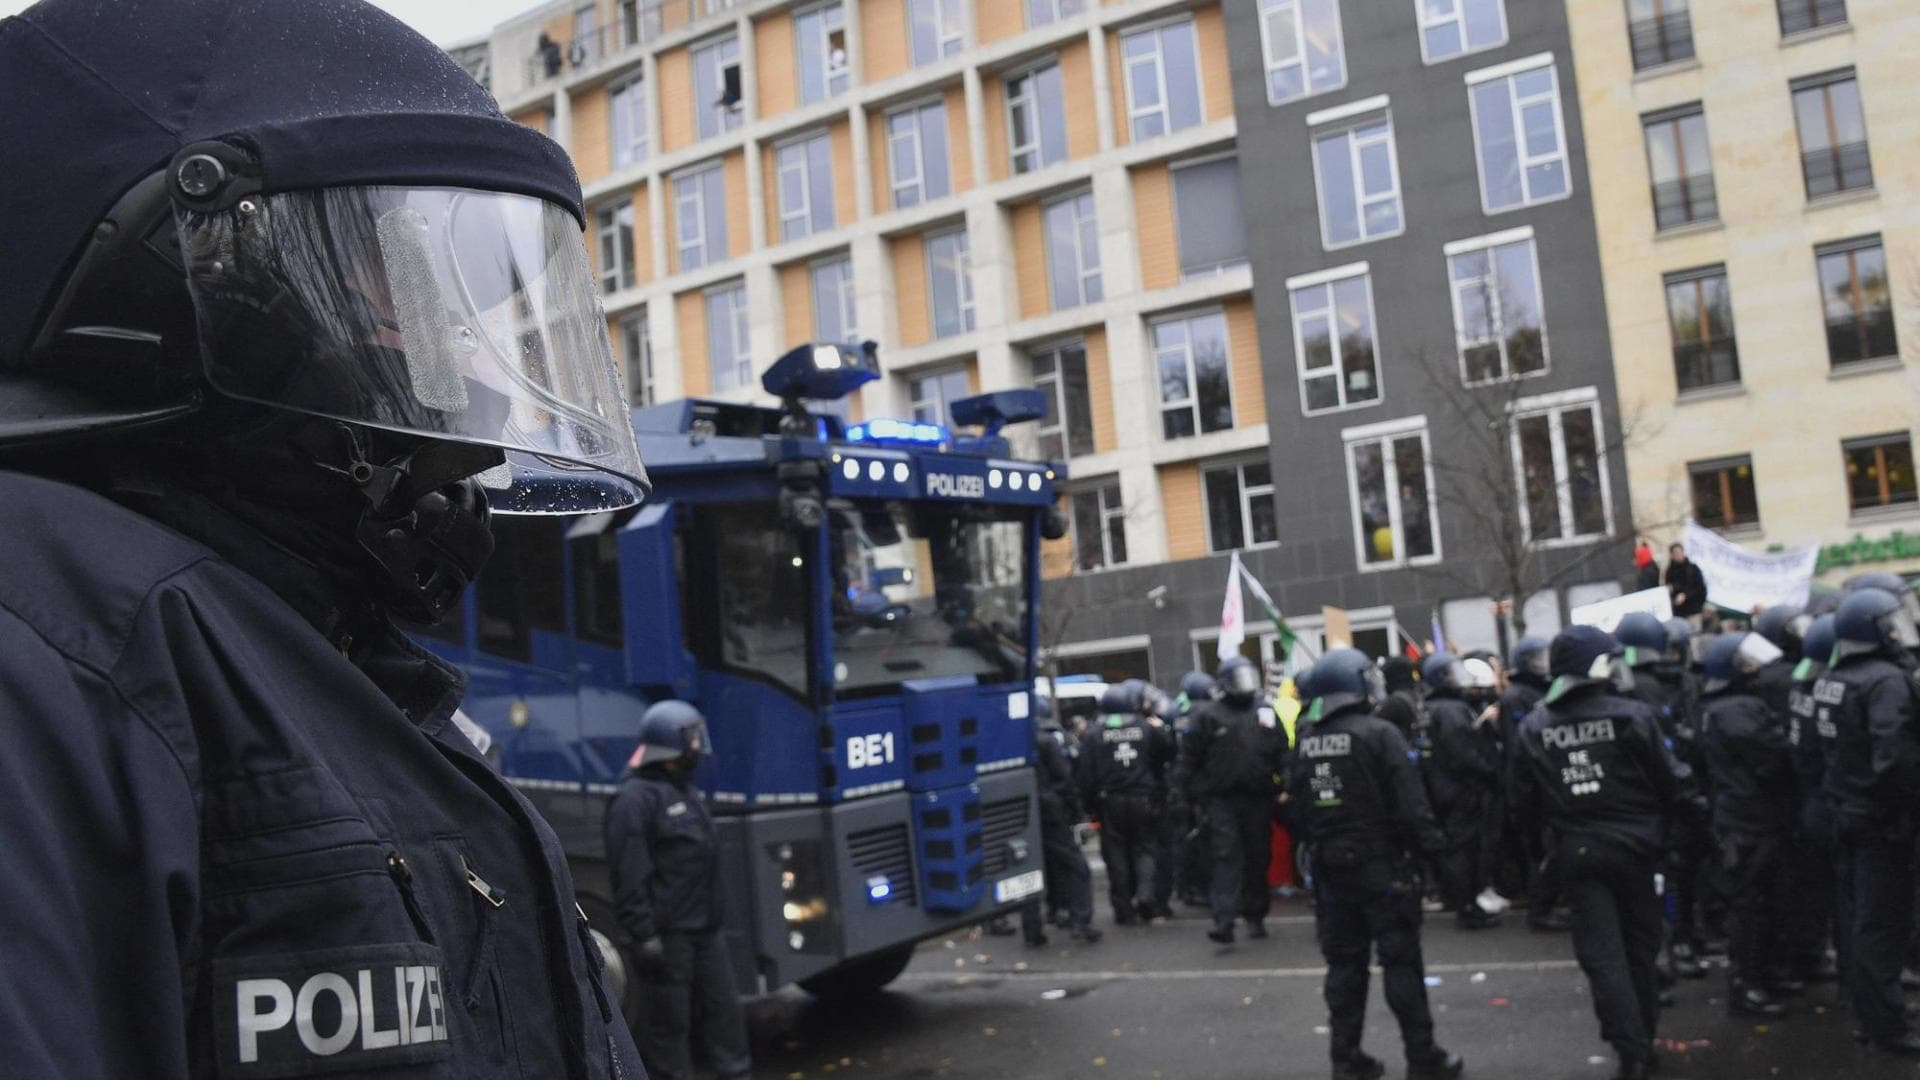 Polizei, Querdenkerdemo, Berlin